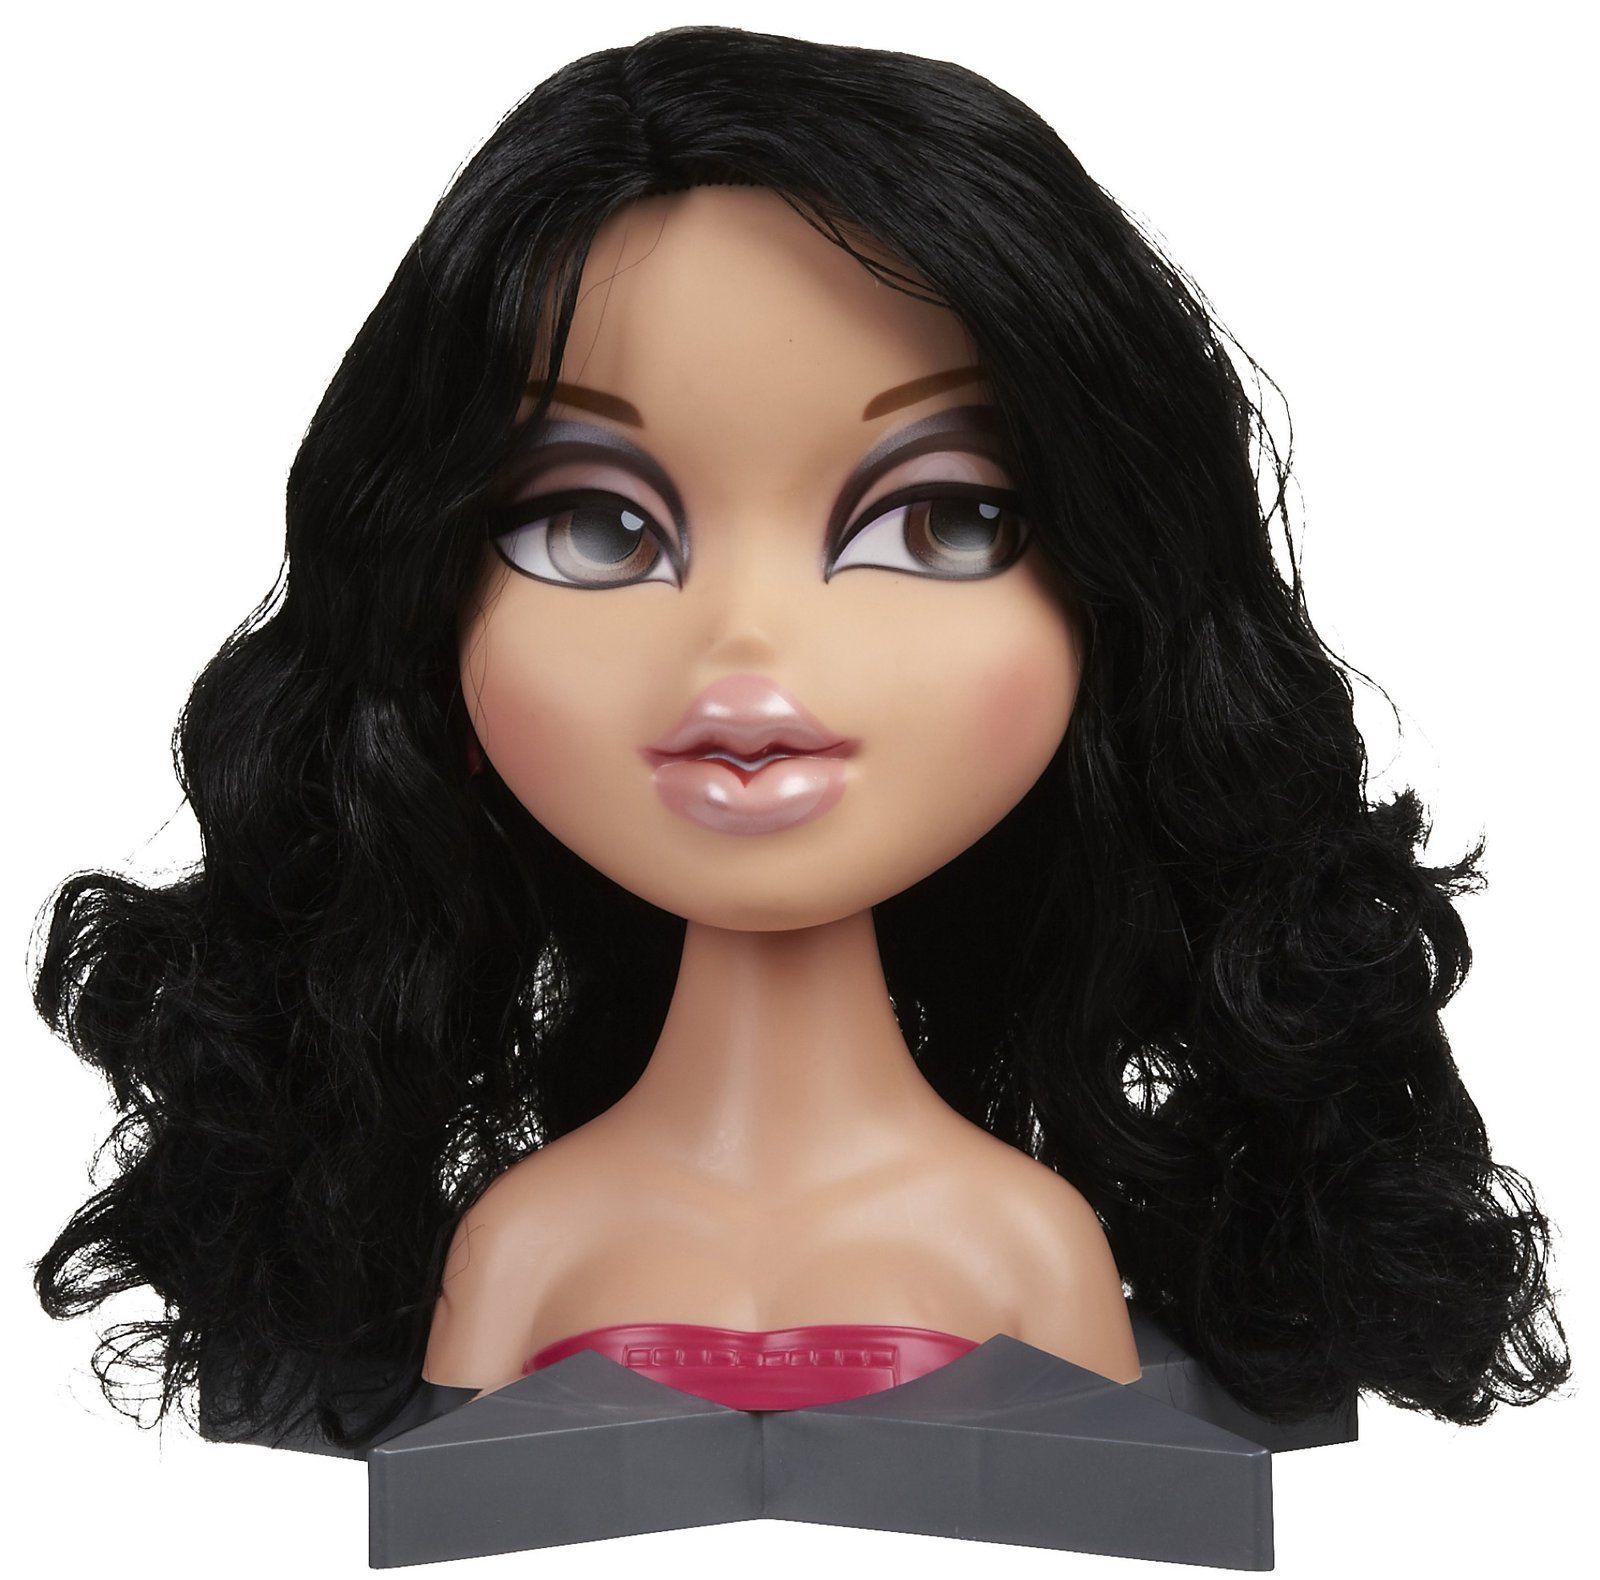 bratz styling head doll - Google Search | Bratz styling ...